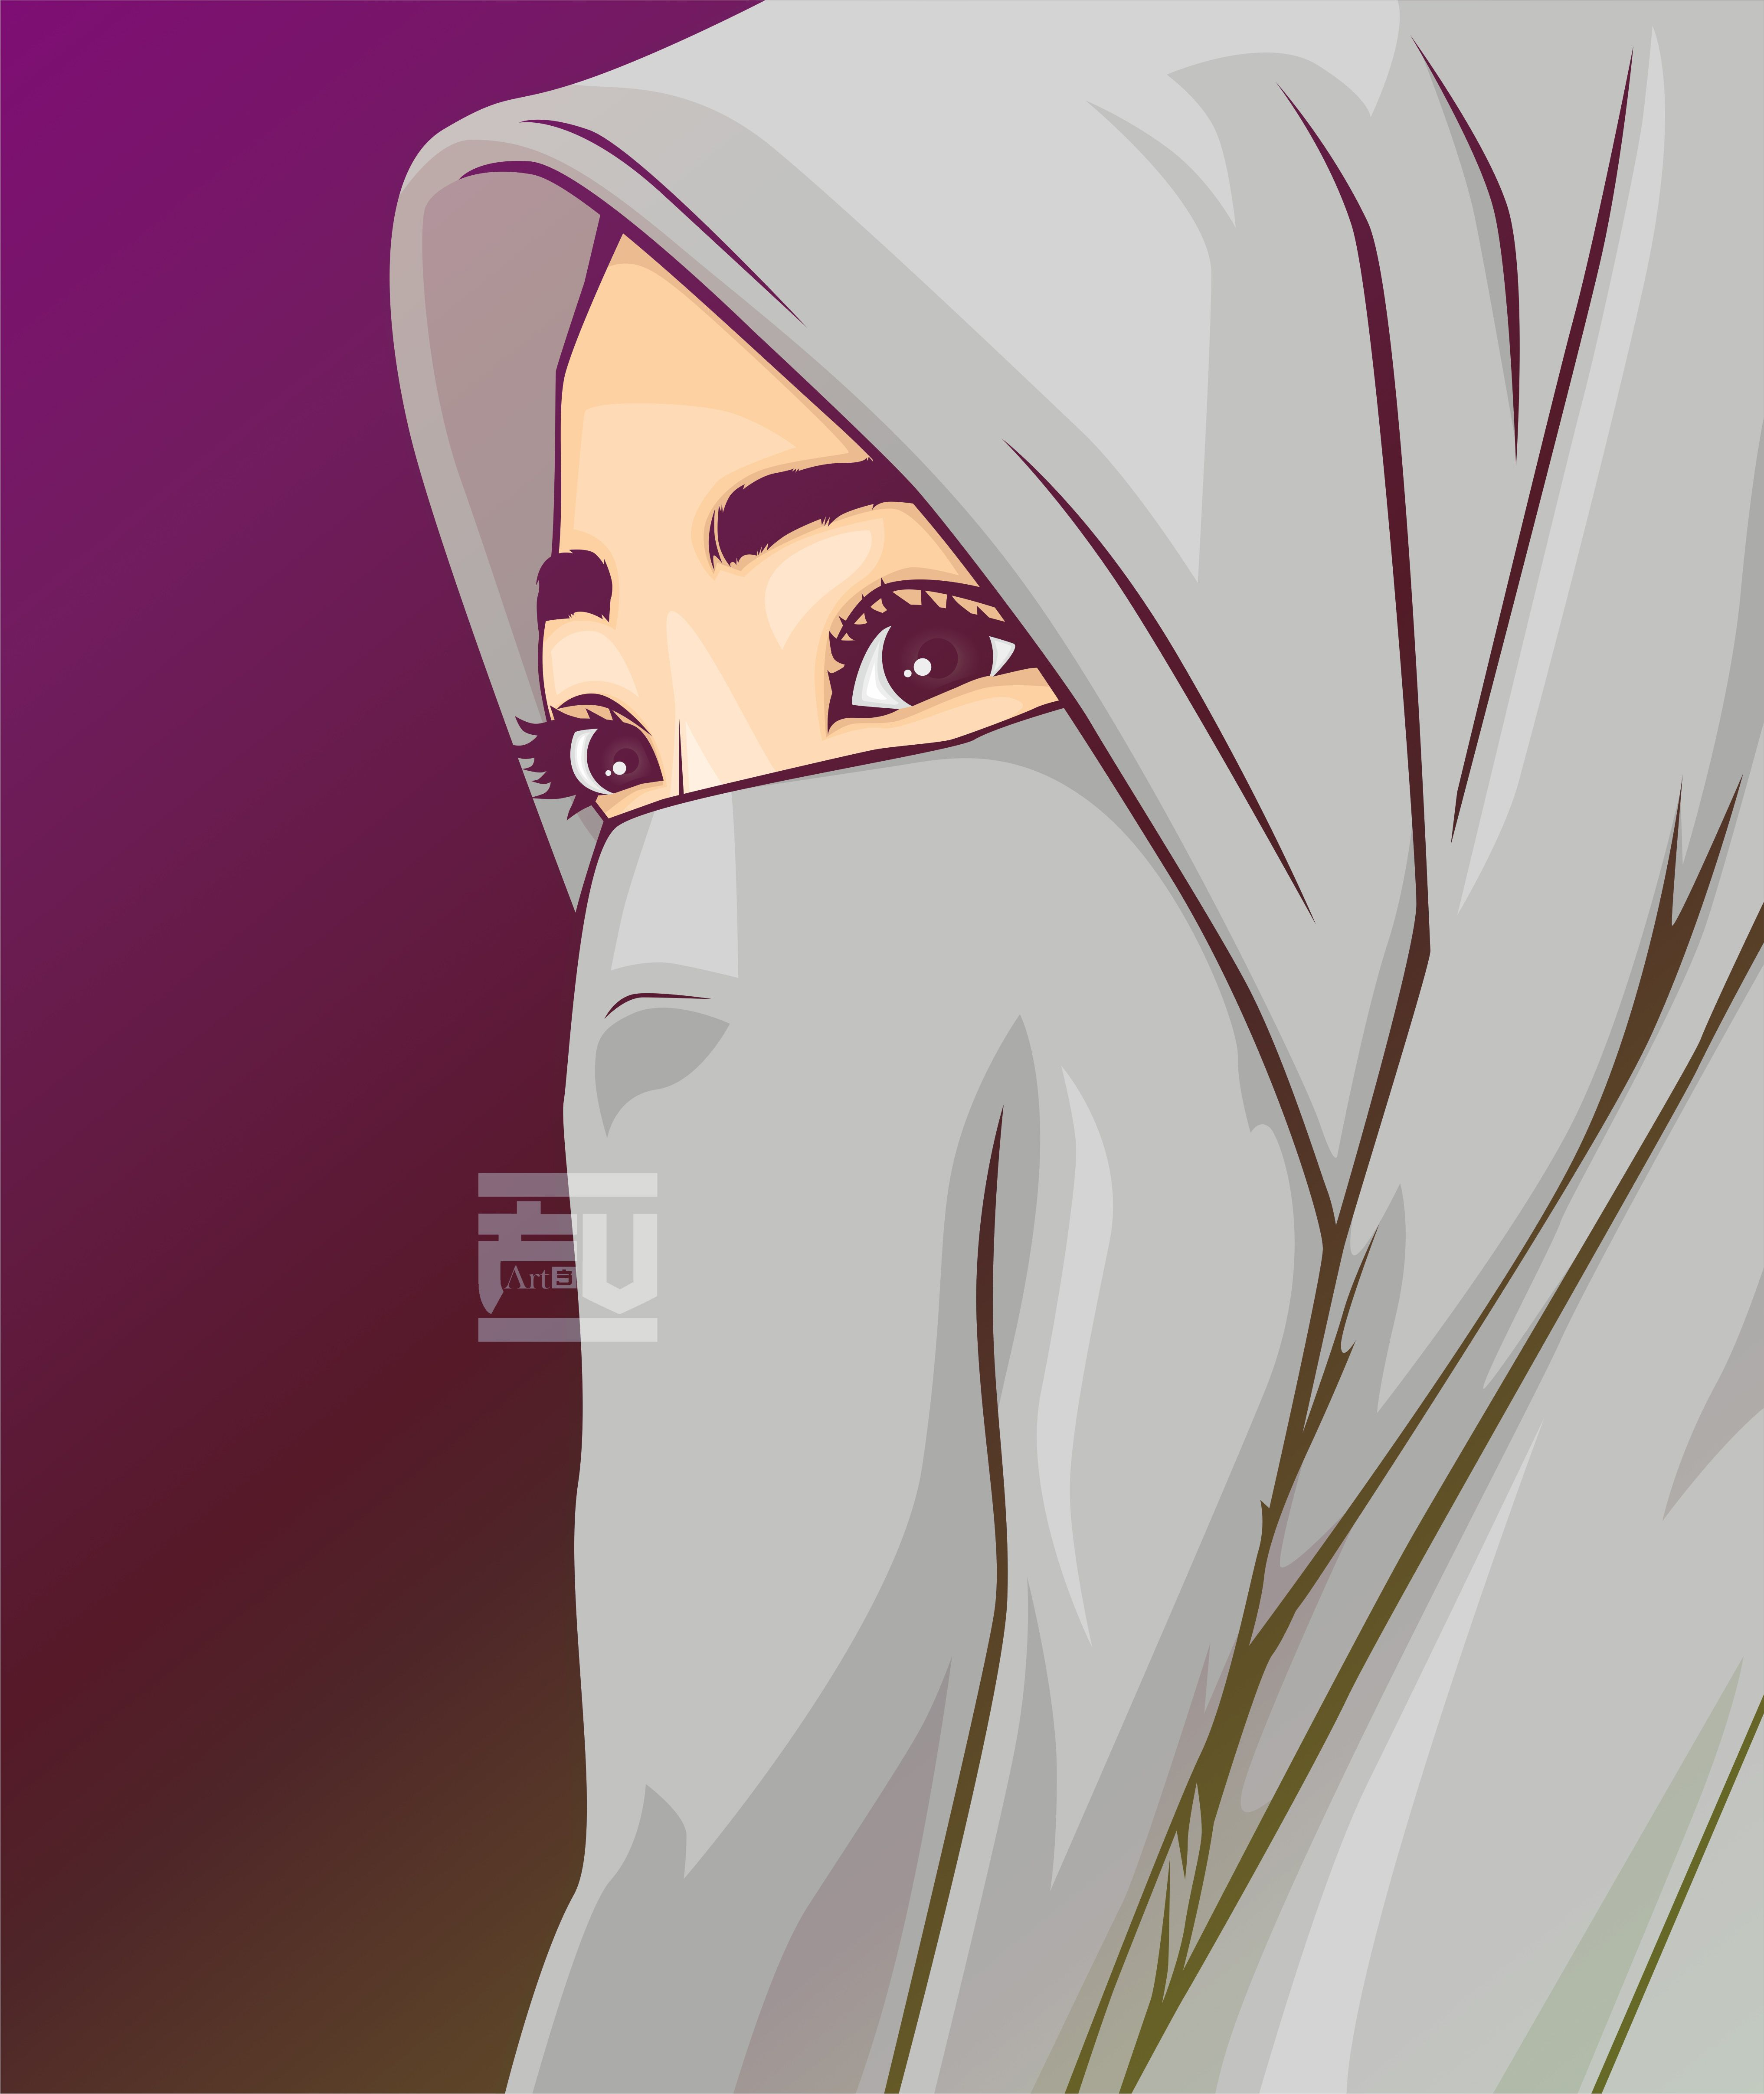 Hijab Vector Niqab Ahmadfu22 Gambar Kartun Gambar Animasi Kartun